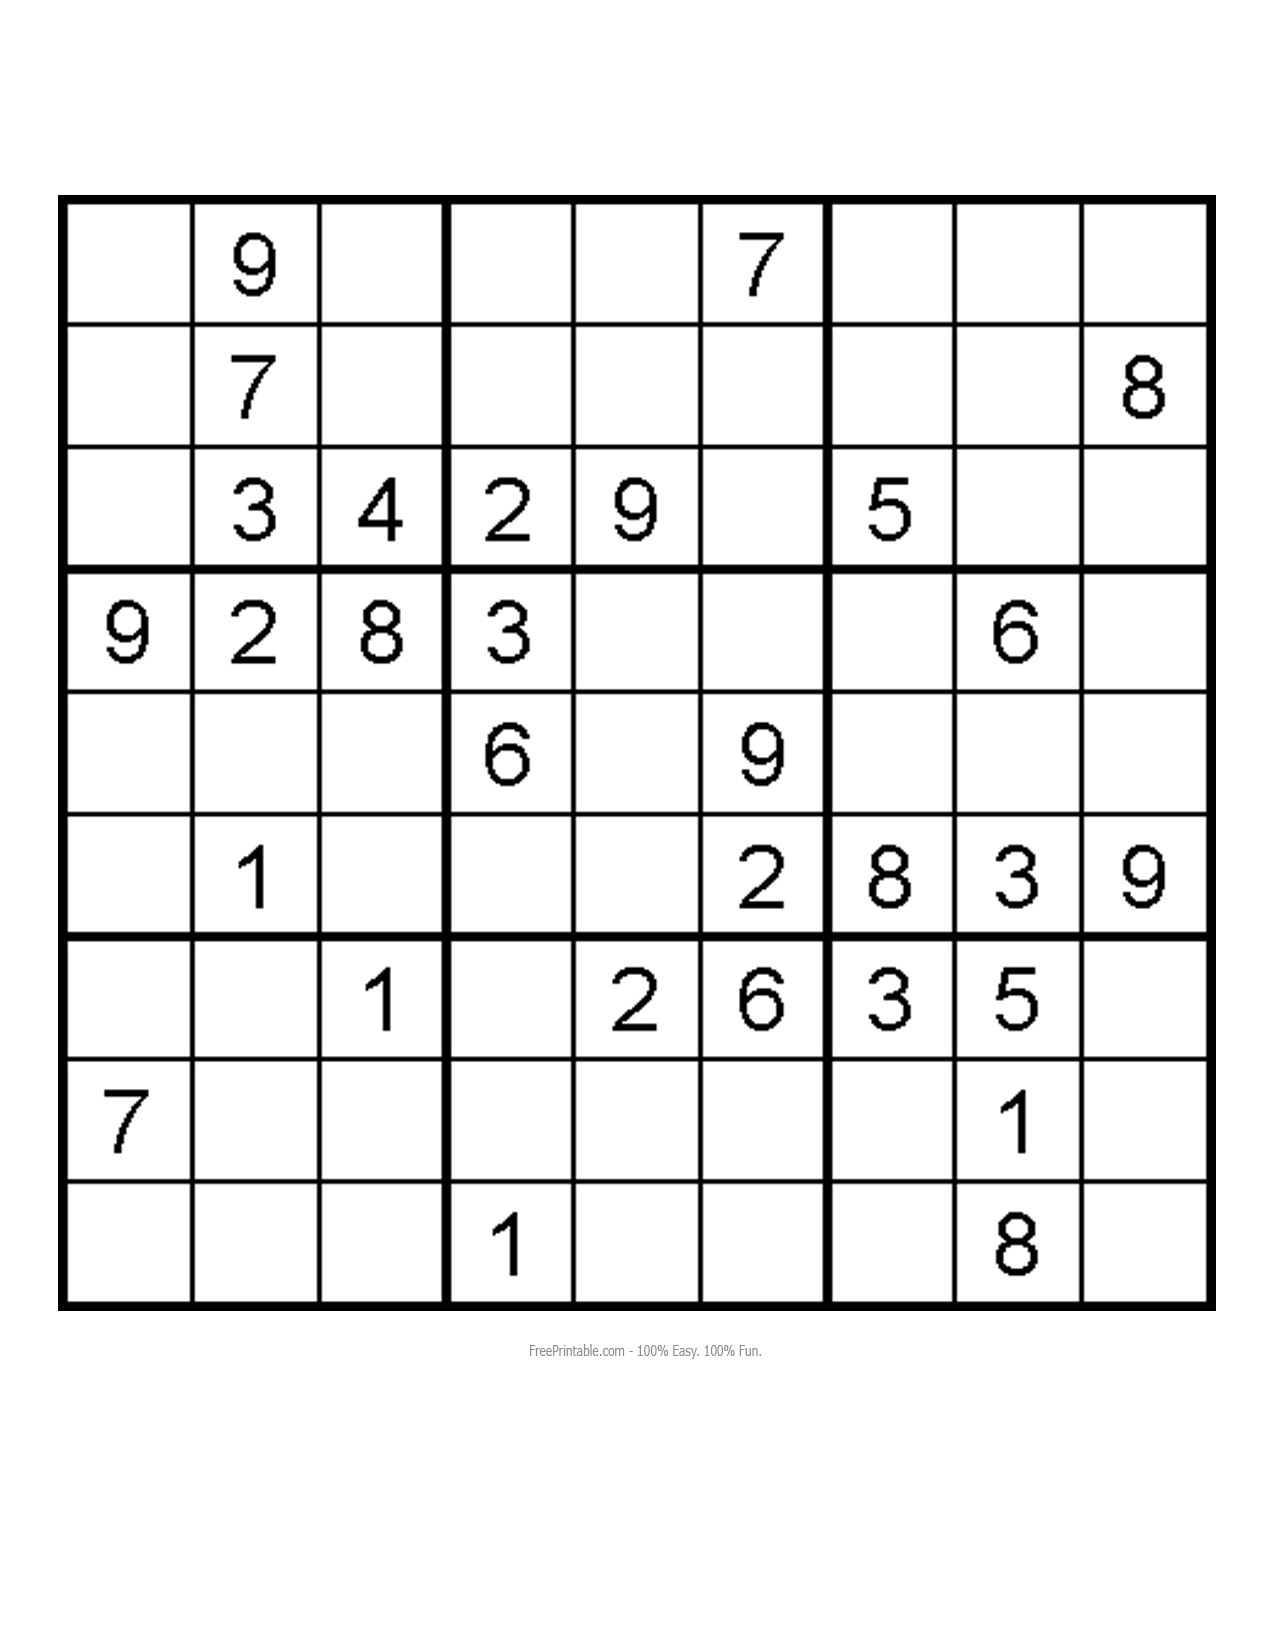 Medium Level Sudoku Printable